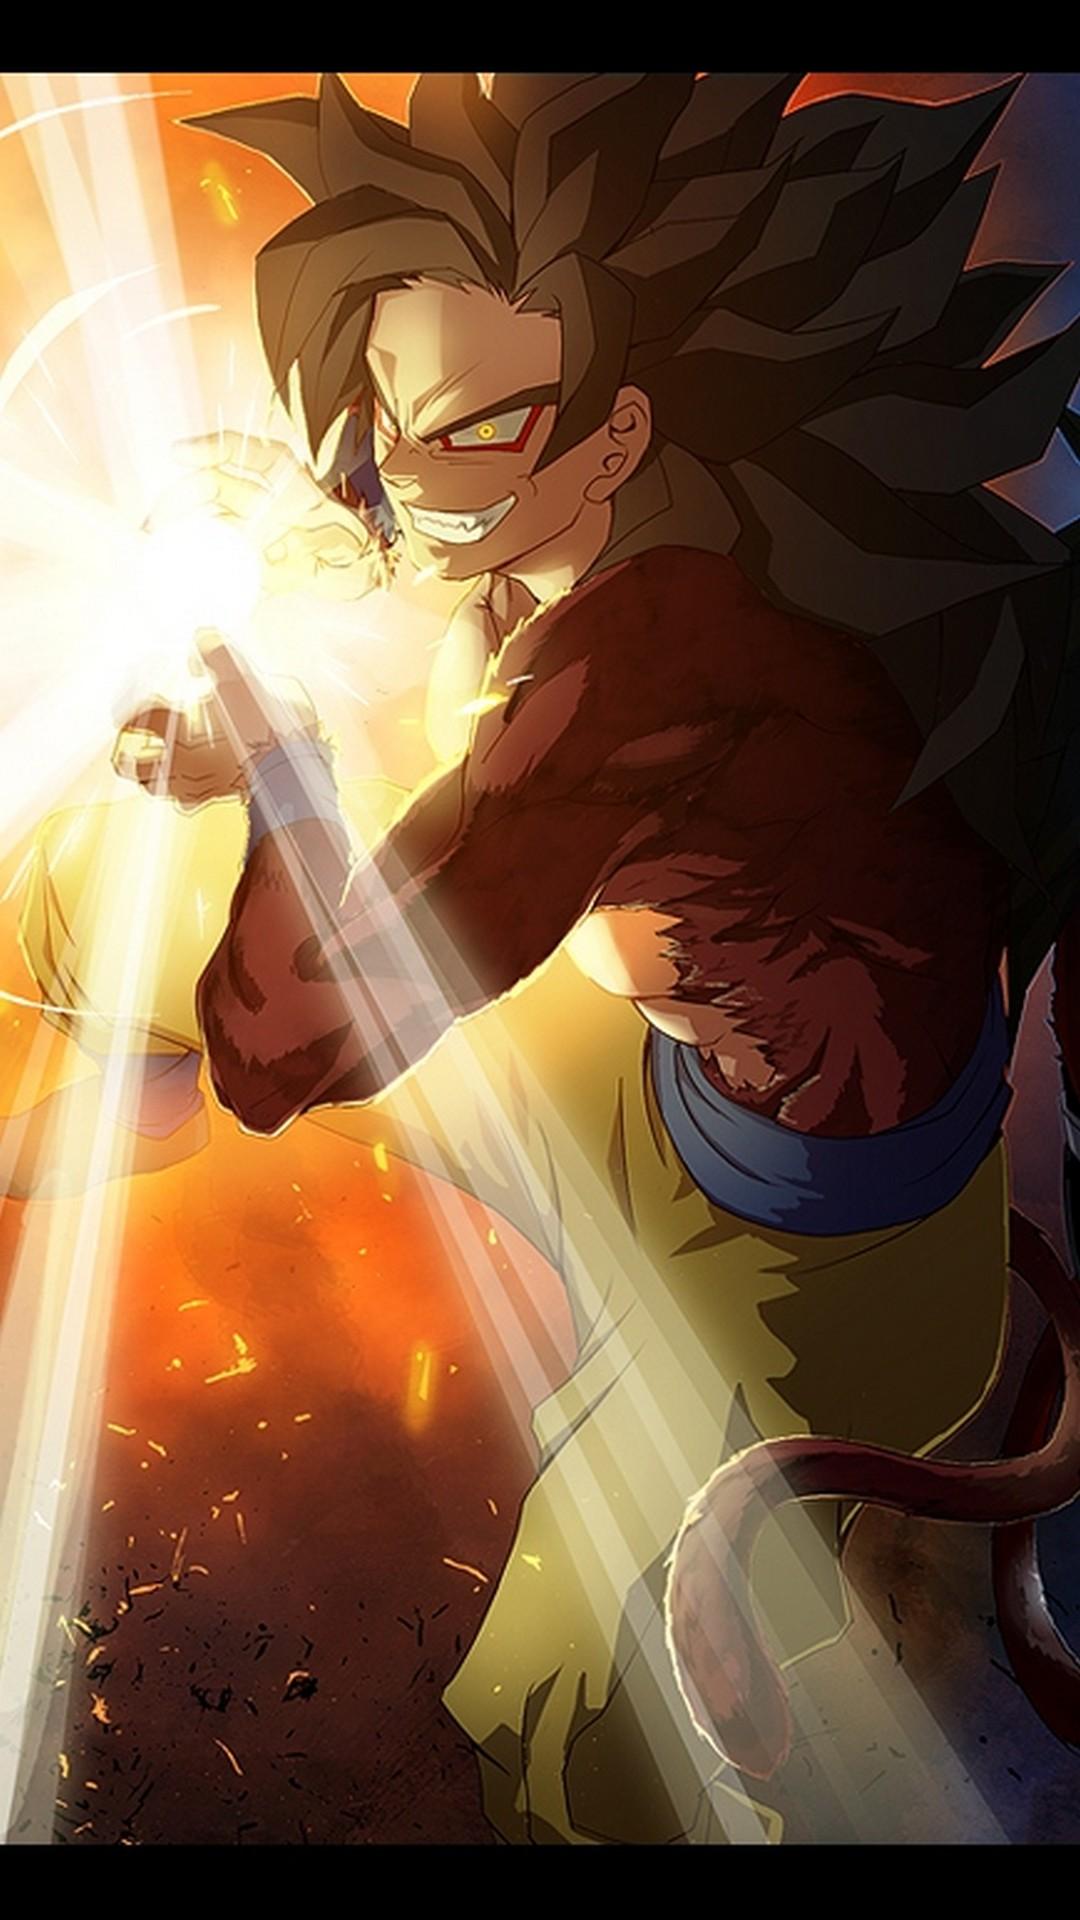 Iphone 7 Wallpaper Goku Ssj4 With Image Resolution - Dragon Ball Z Amazing - HD Wallpaper